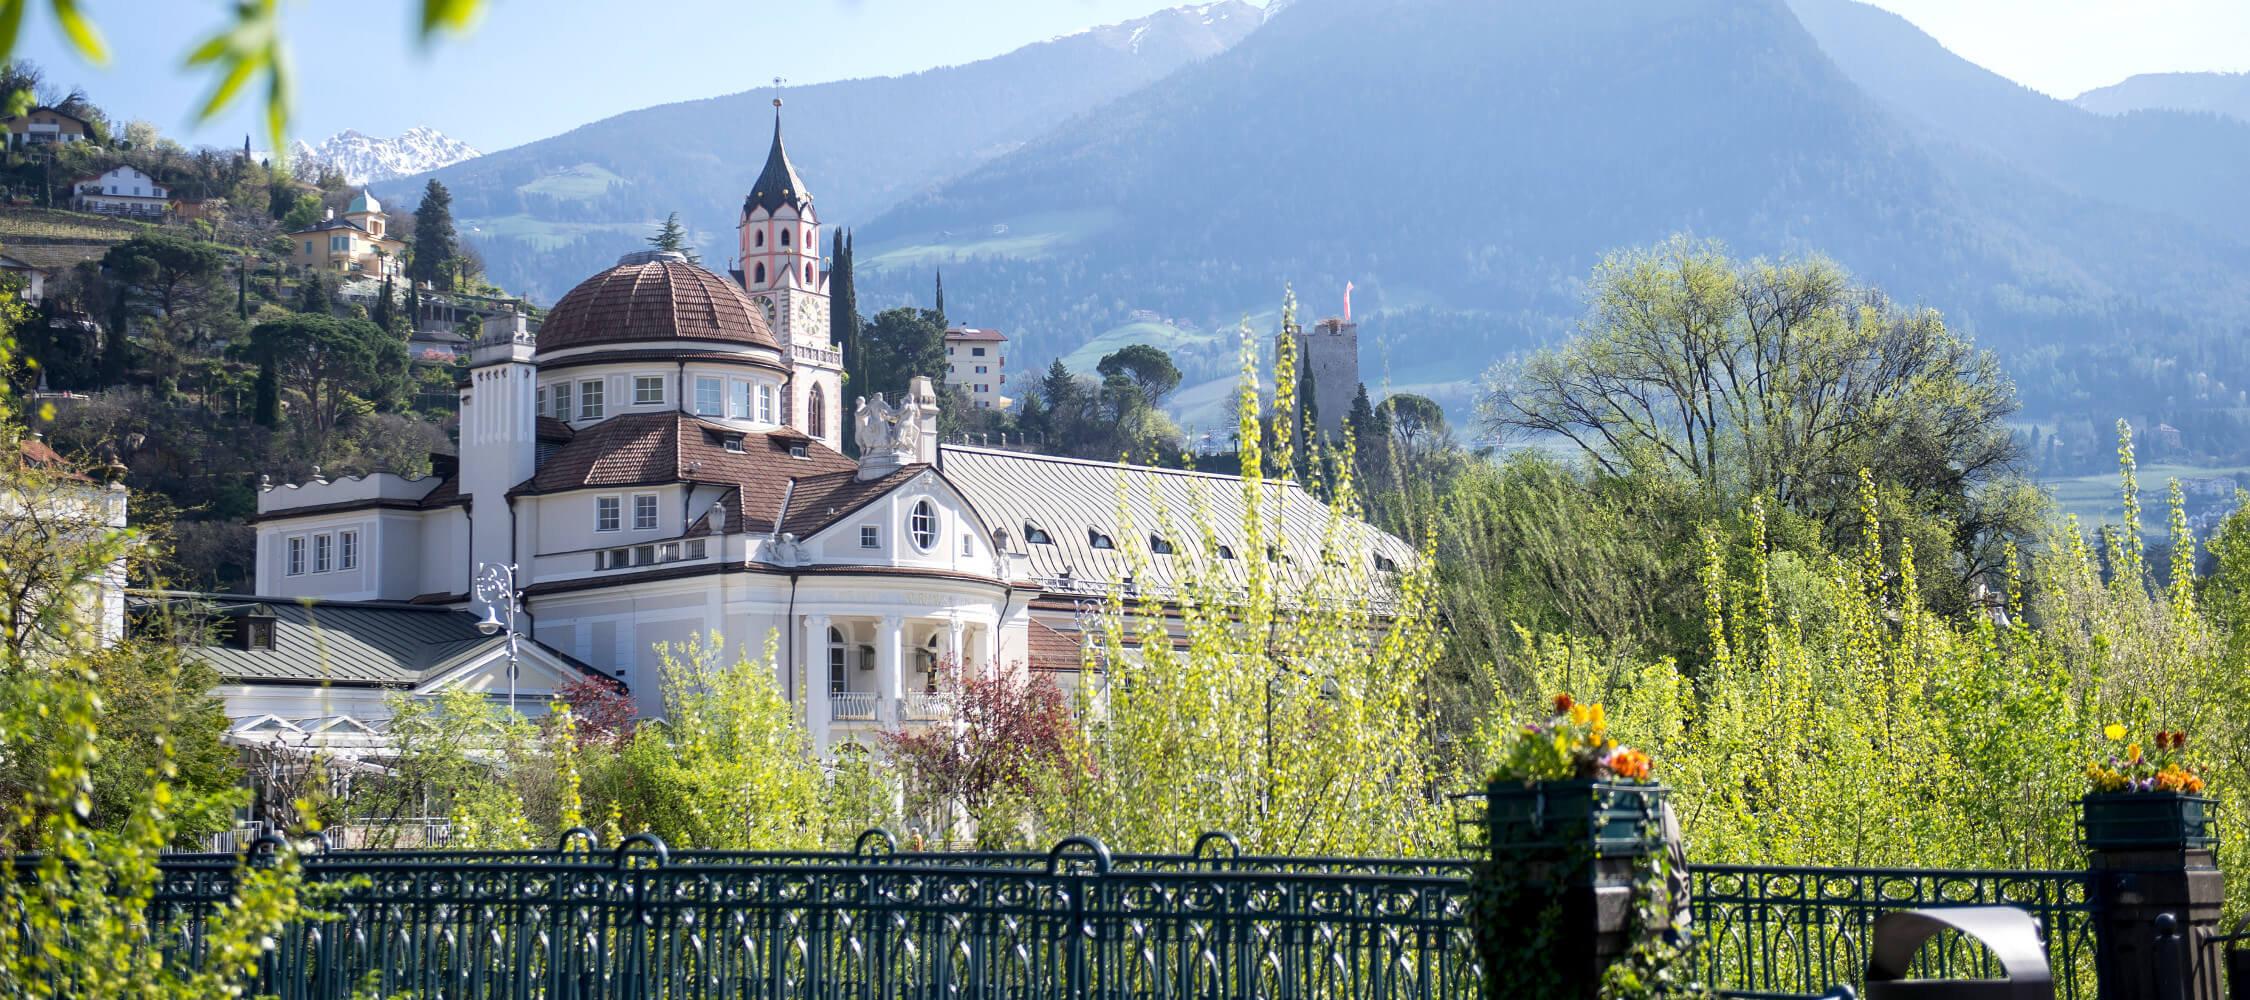 Italien-Trentino_Suedtirol_Alto_Adige_Merano_Meran_Besichtigen_Natur_Promenade_Kurhaus_Spring_Kurverwaltung-Alex-Filz_mgm01135kume_2250x1000